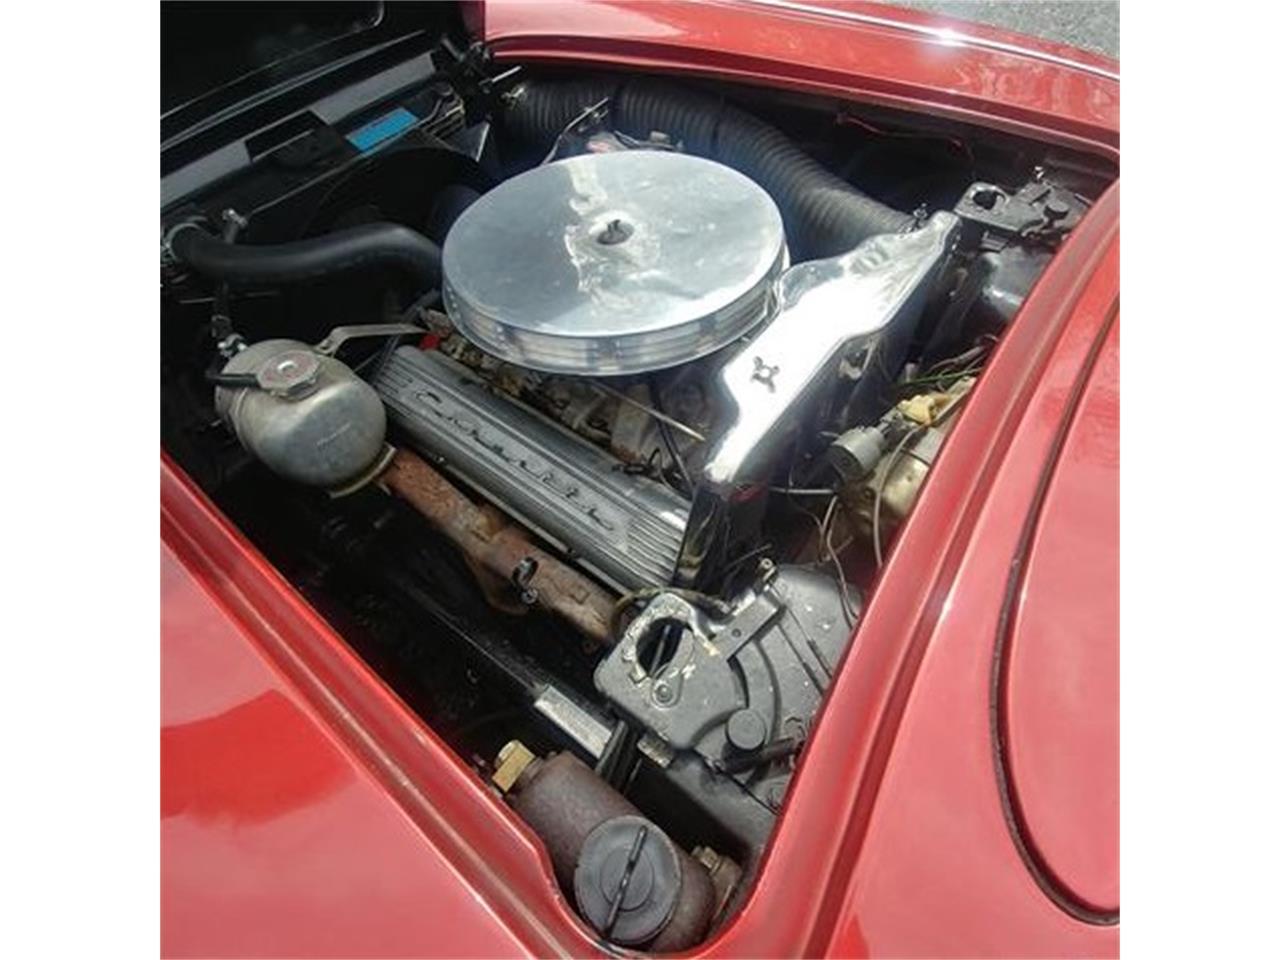 1962 Chevrolet Corvette (CC-1356781) for sale in Hummelstown, Pennsylvania